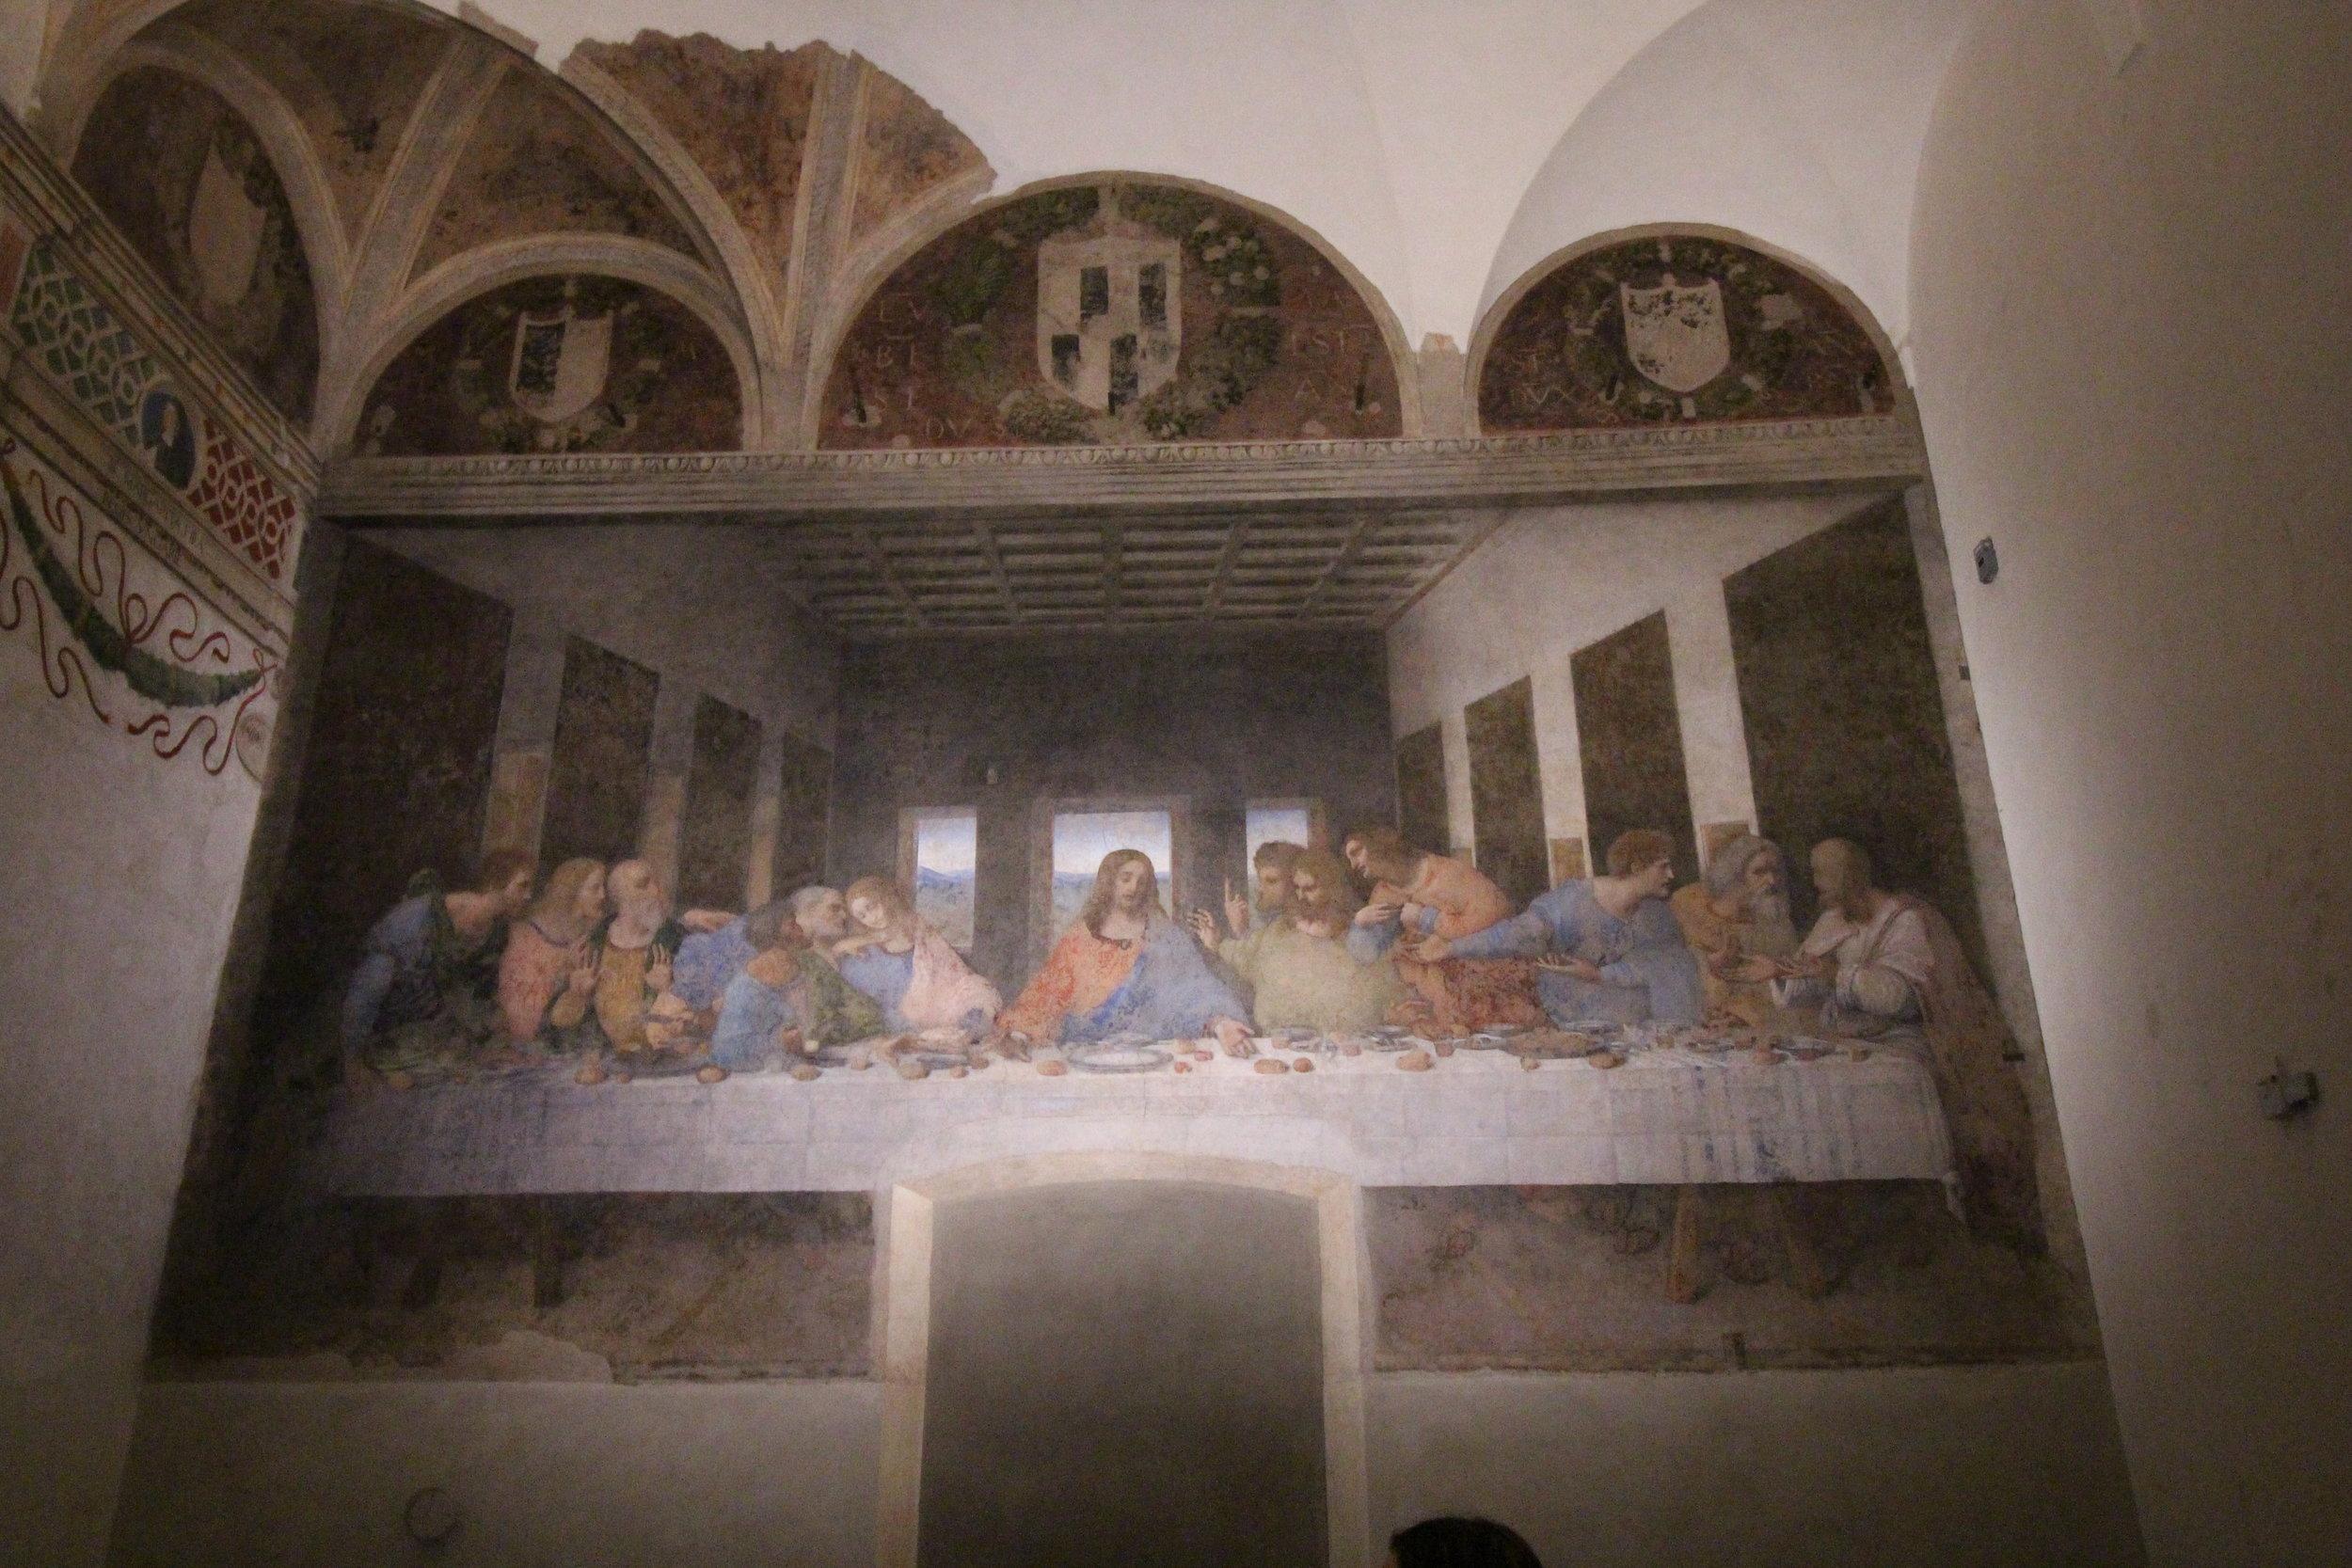 Convent of Santa Maria delle Grazie, Milan, Italy